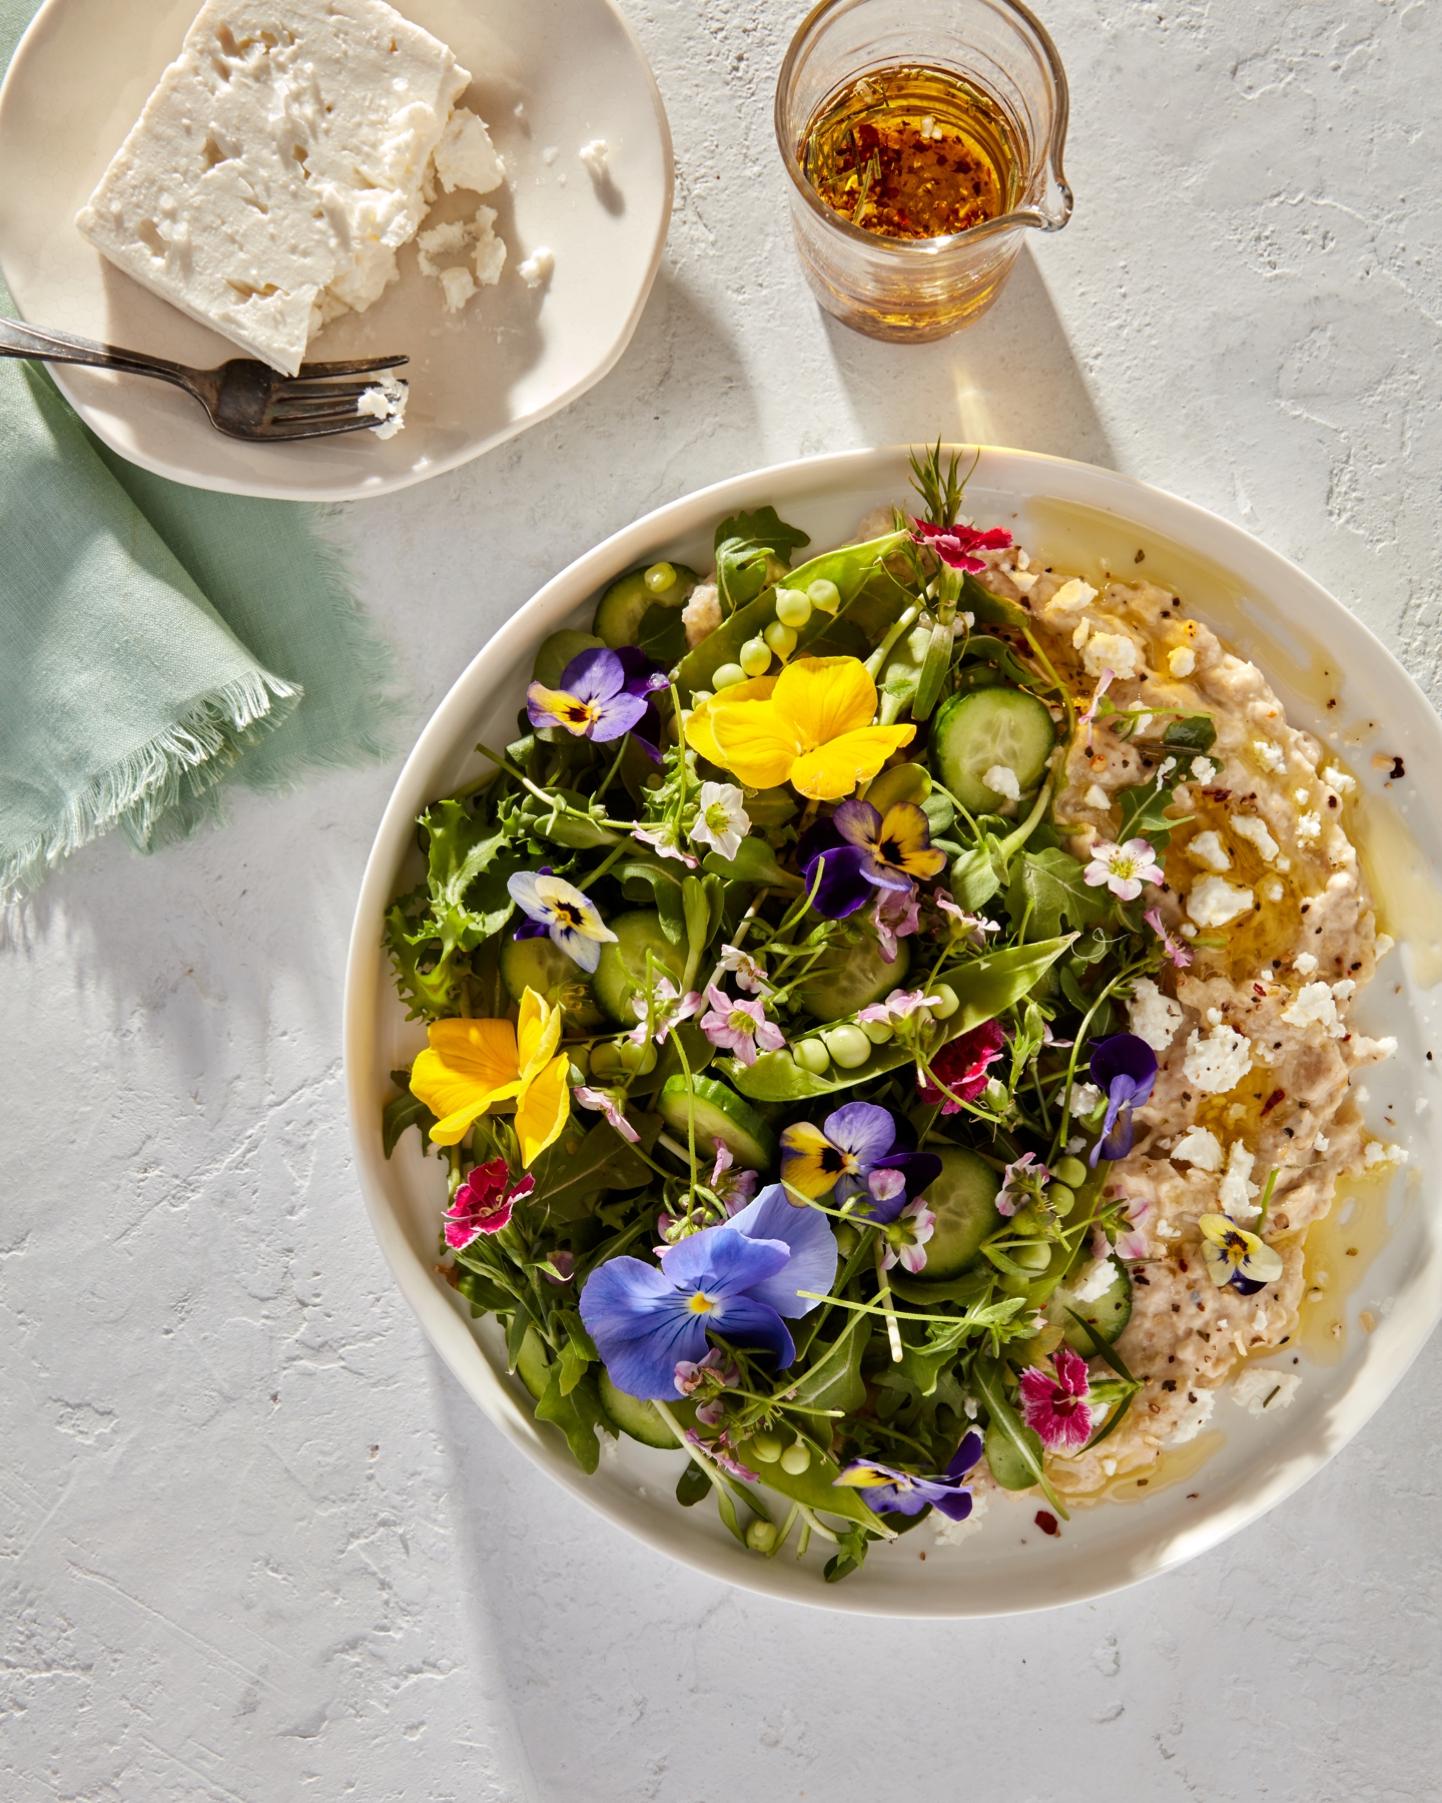 Atlanta Food Photographer ©Kathryn McCrary Photography Rachael Daylong Food Stylist Floral Salad_0005.jpg